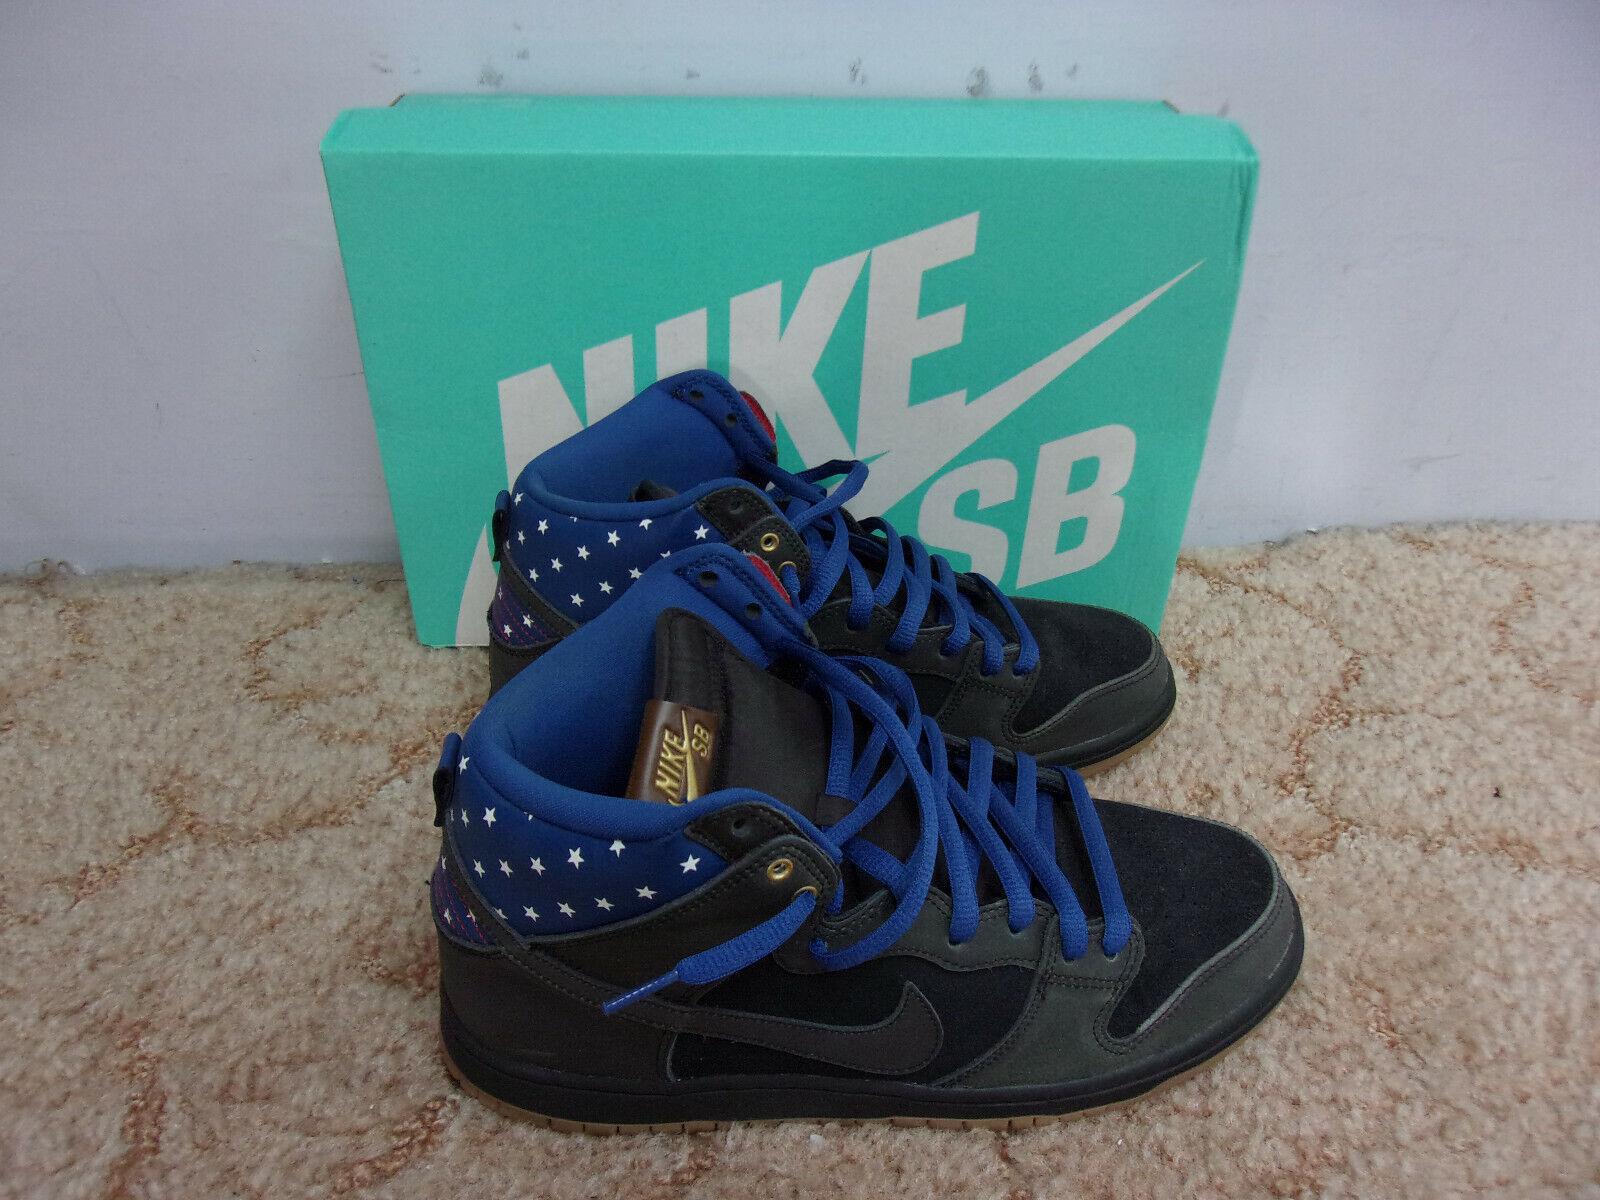 NIKE Dunk High Premium SB Black + White Stars Stars Stars on bluee shoes w Box Size 10.5 S11 ee3459